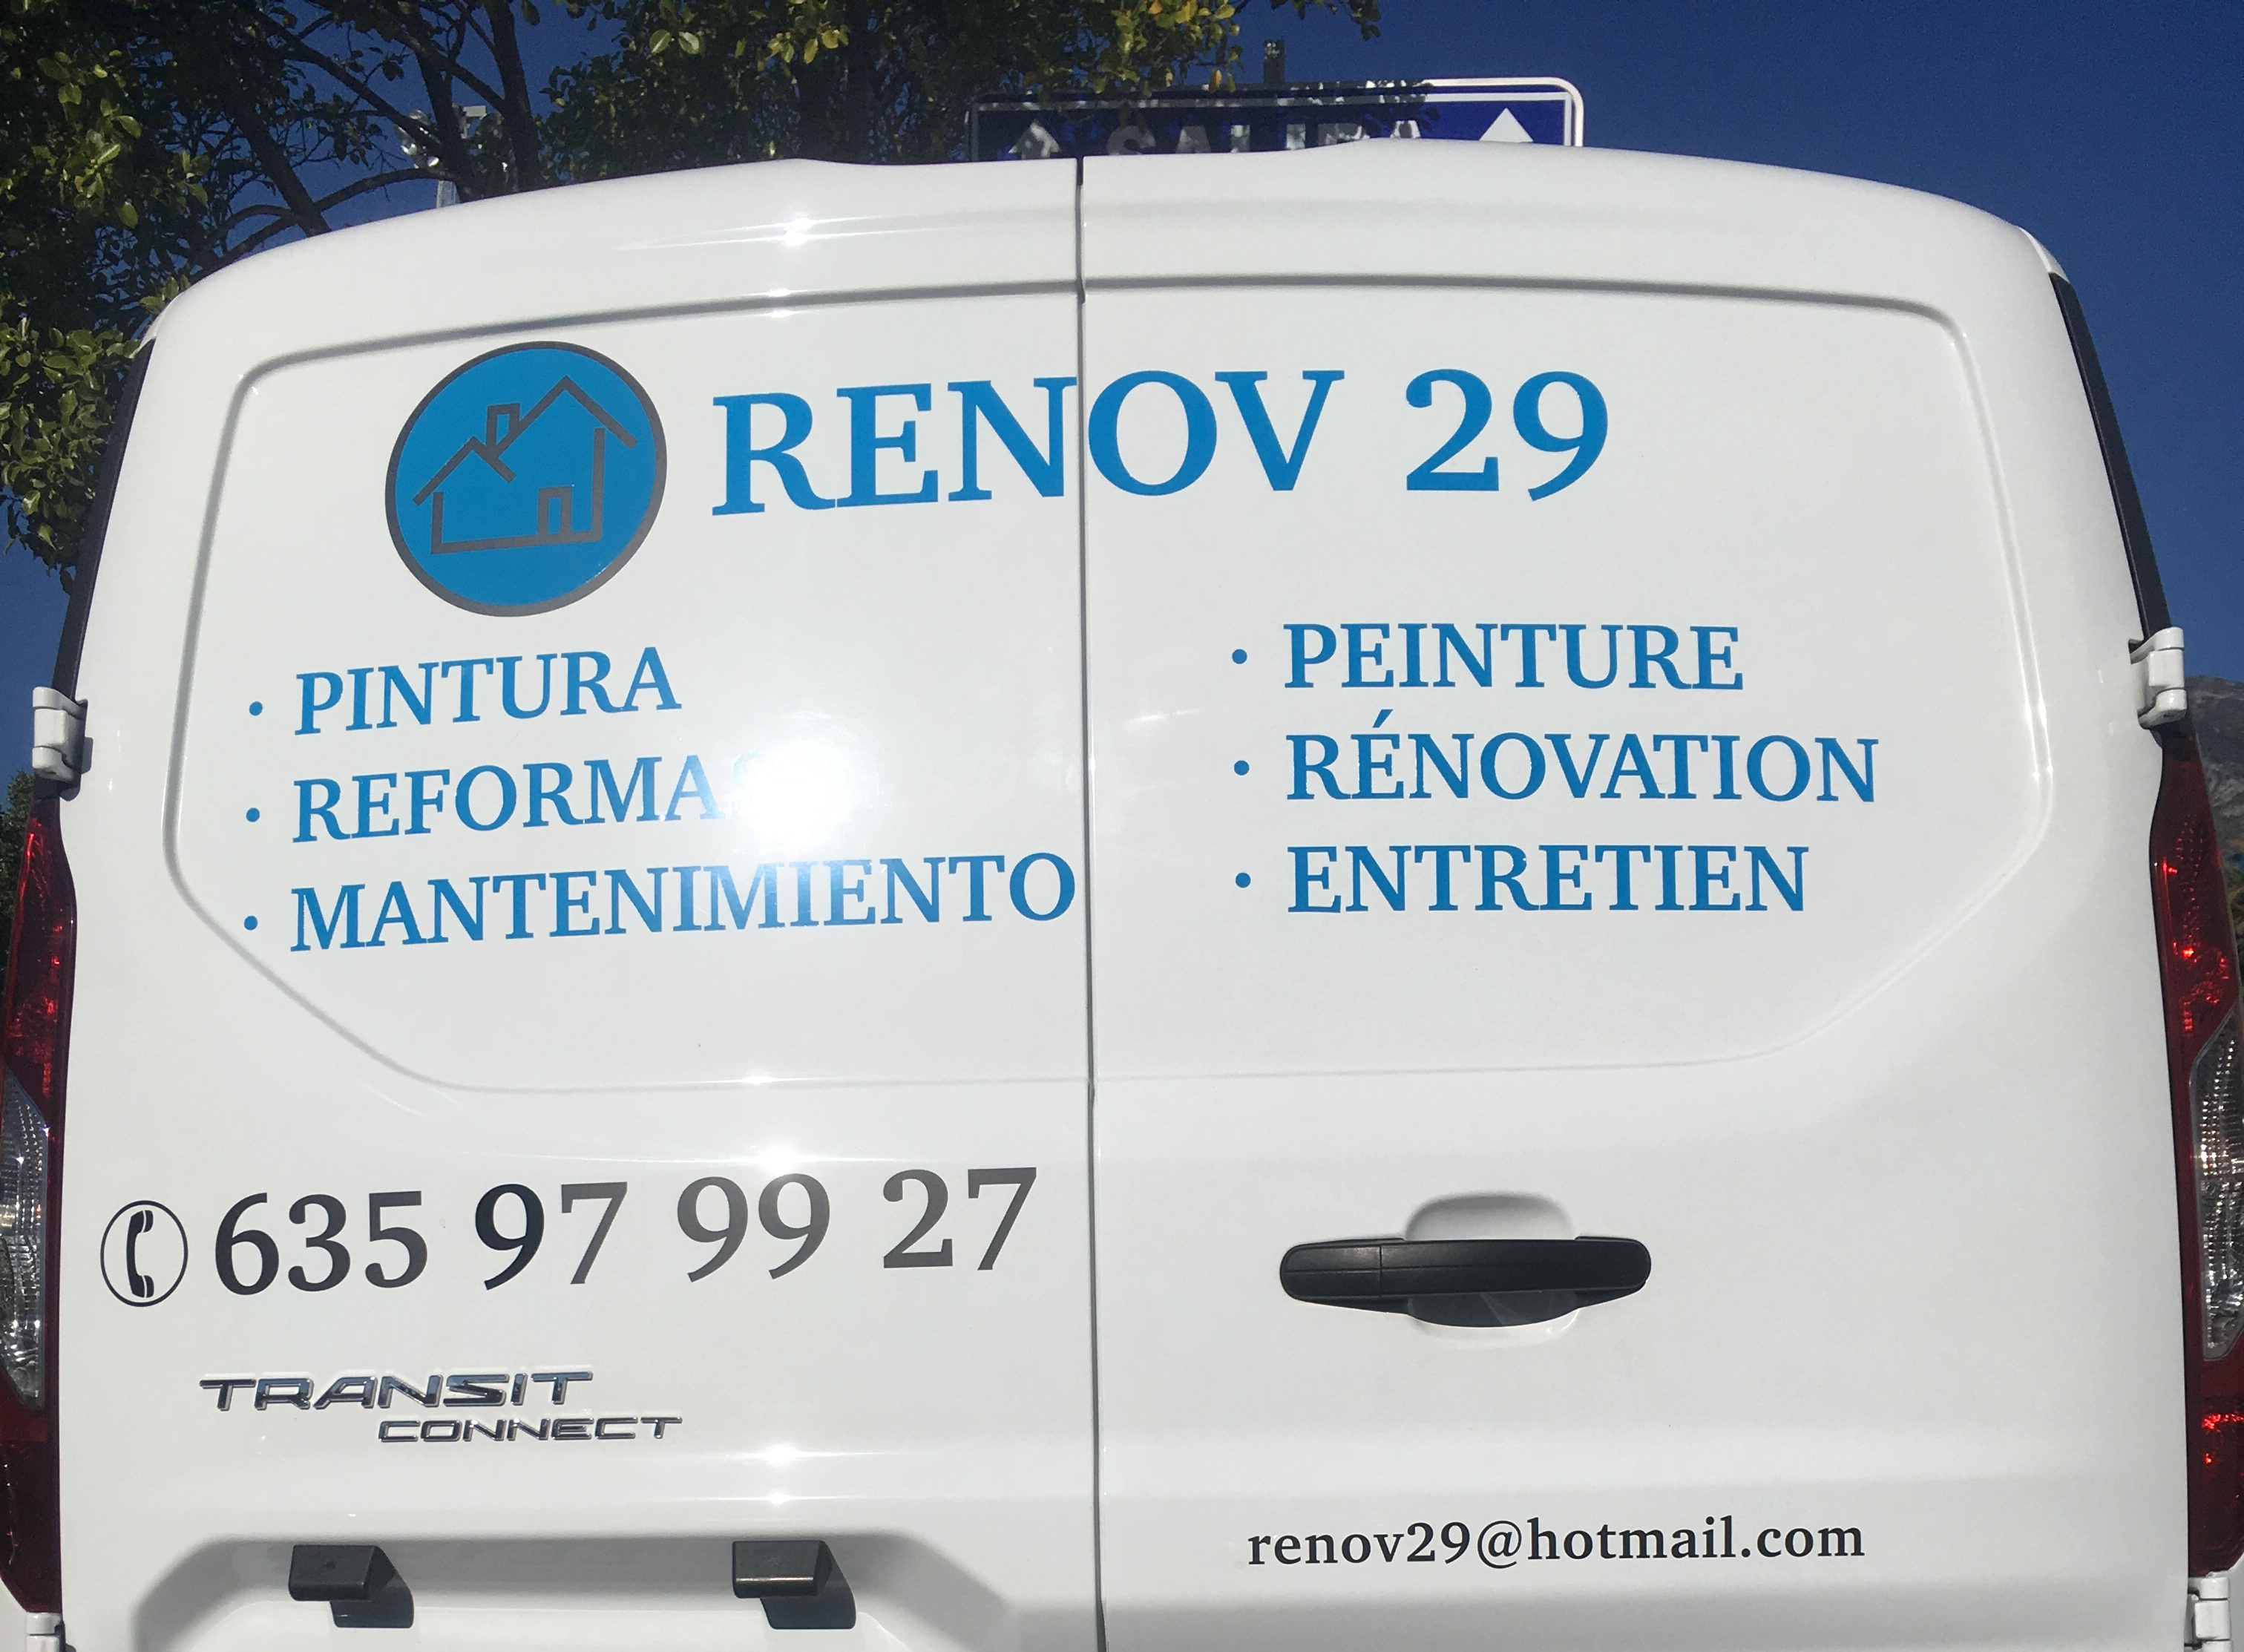 Renov29